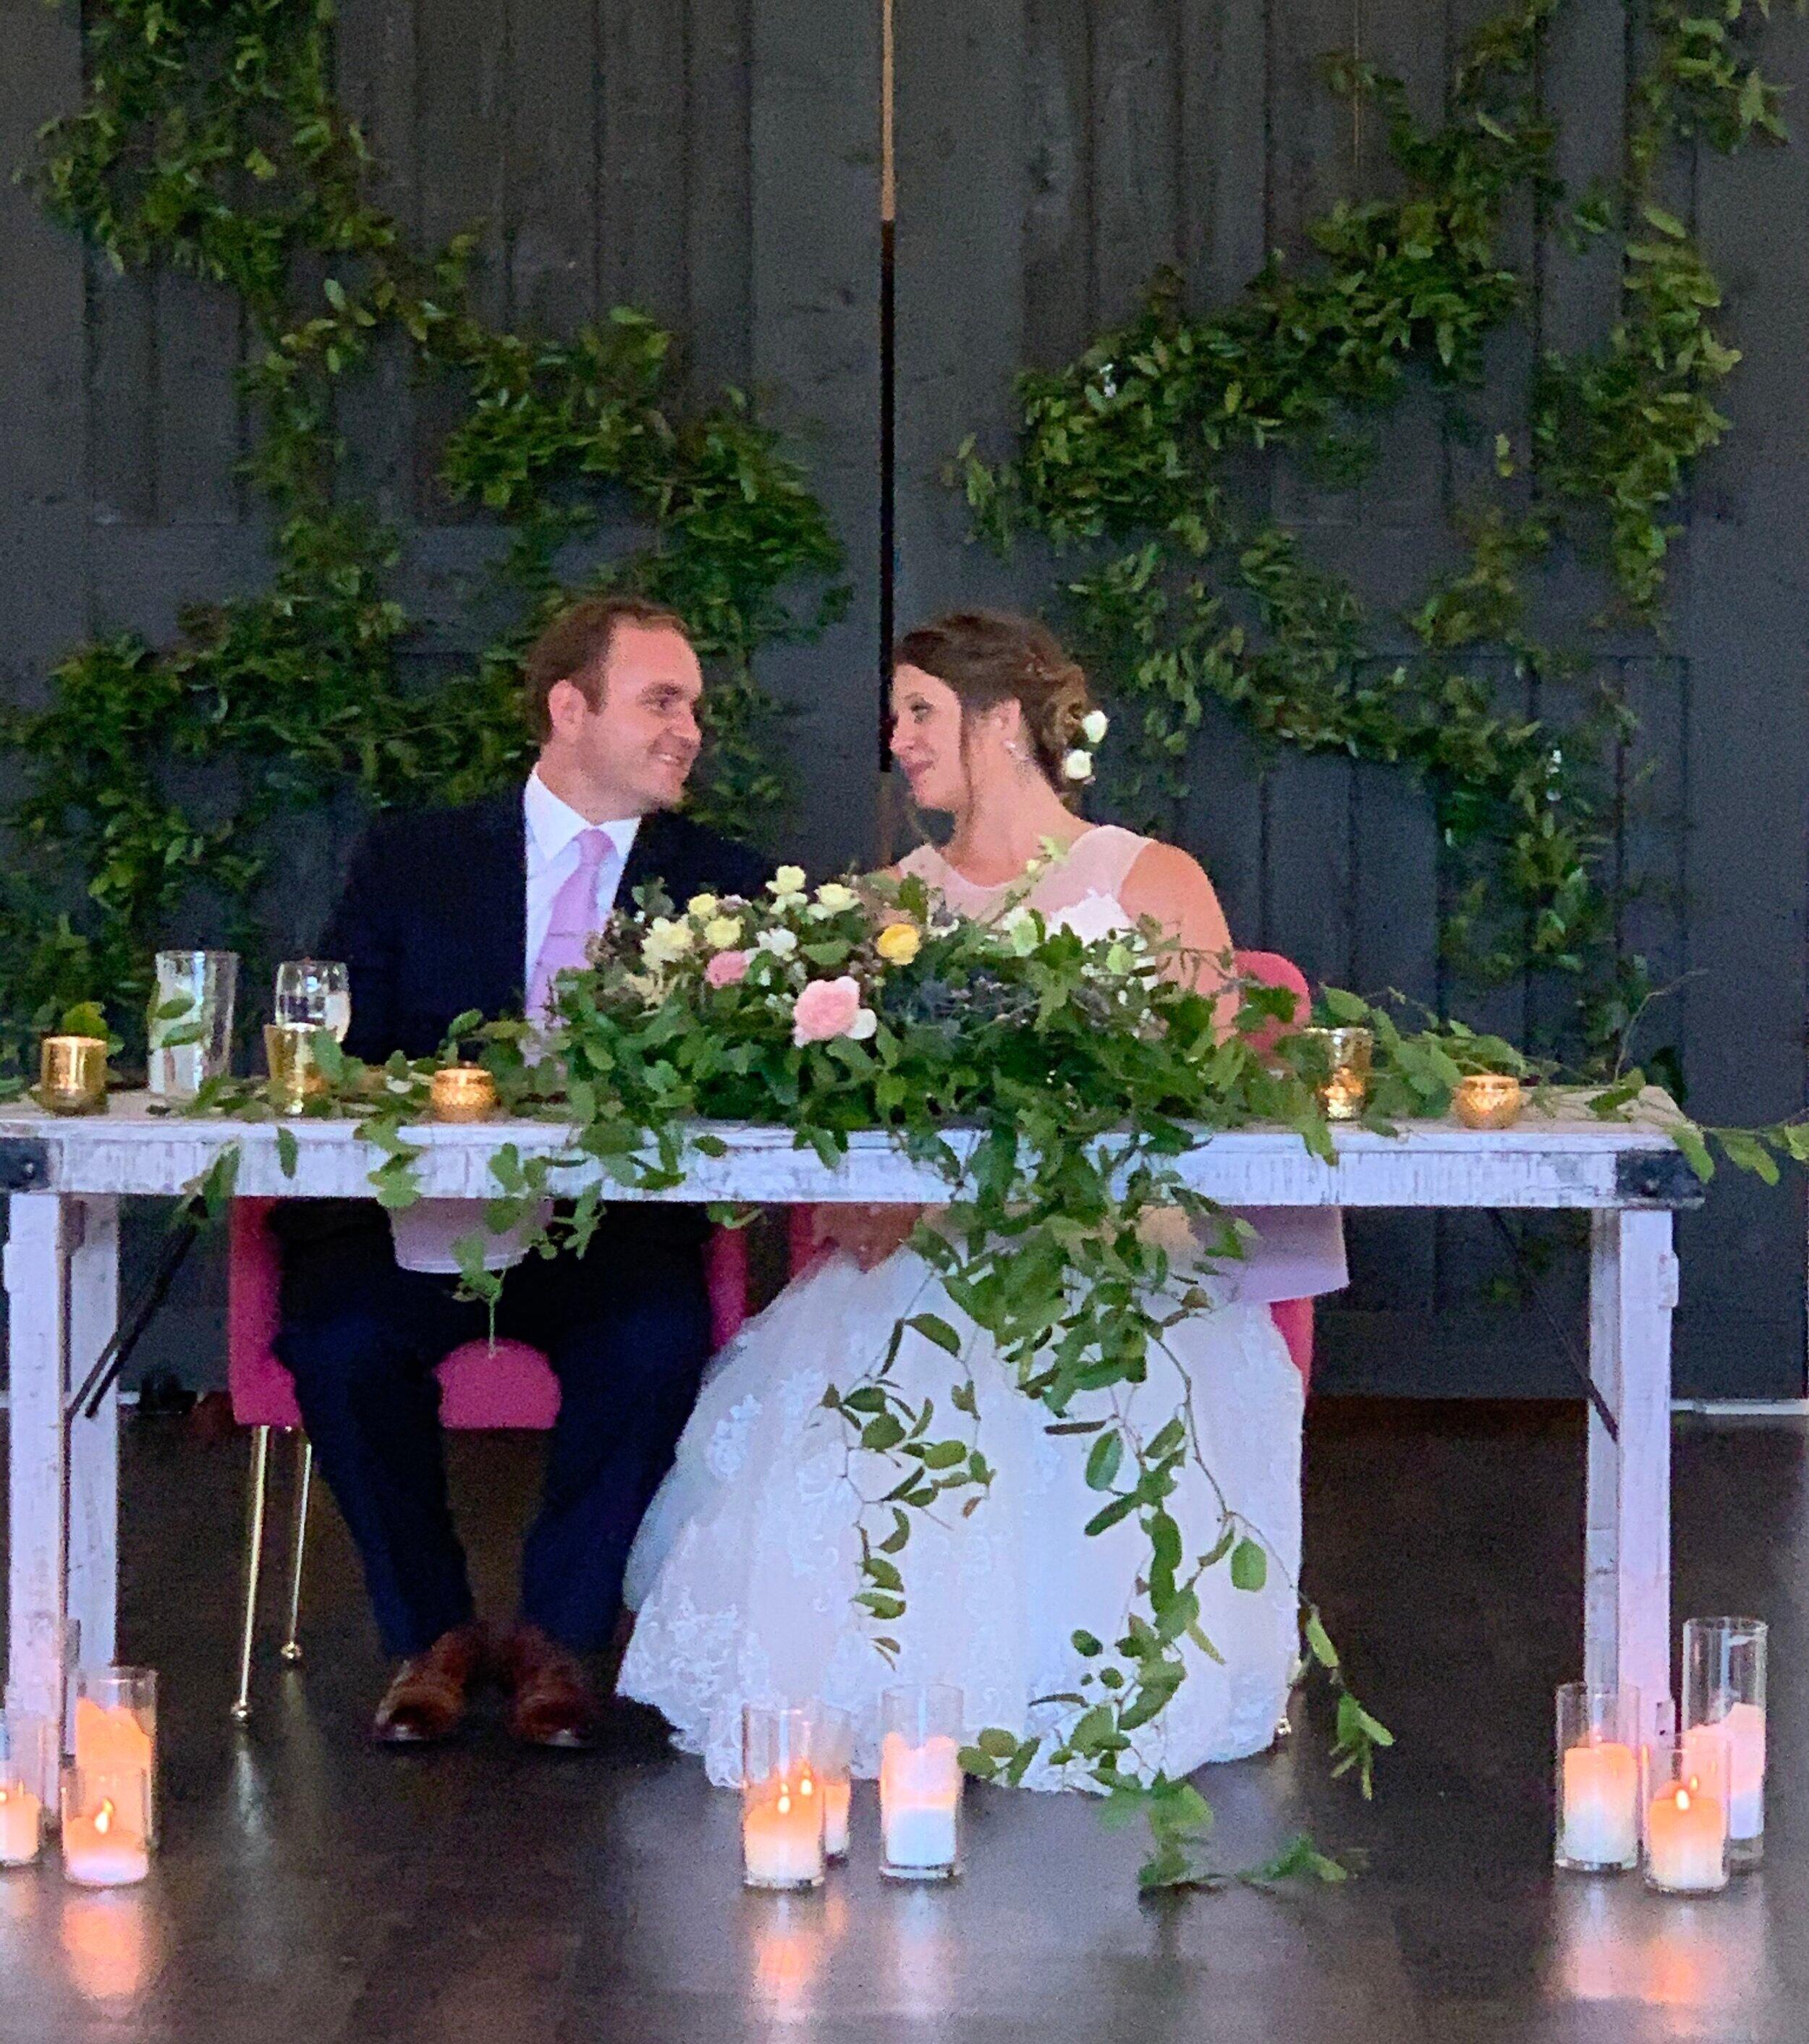 Small Intimate Wedding - The Venue At Daisy Hill, Fayetteville, Georgia